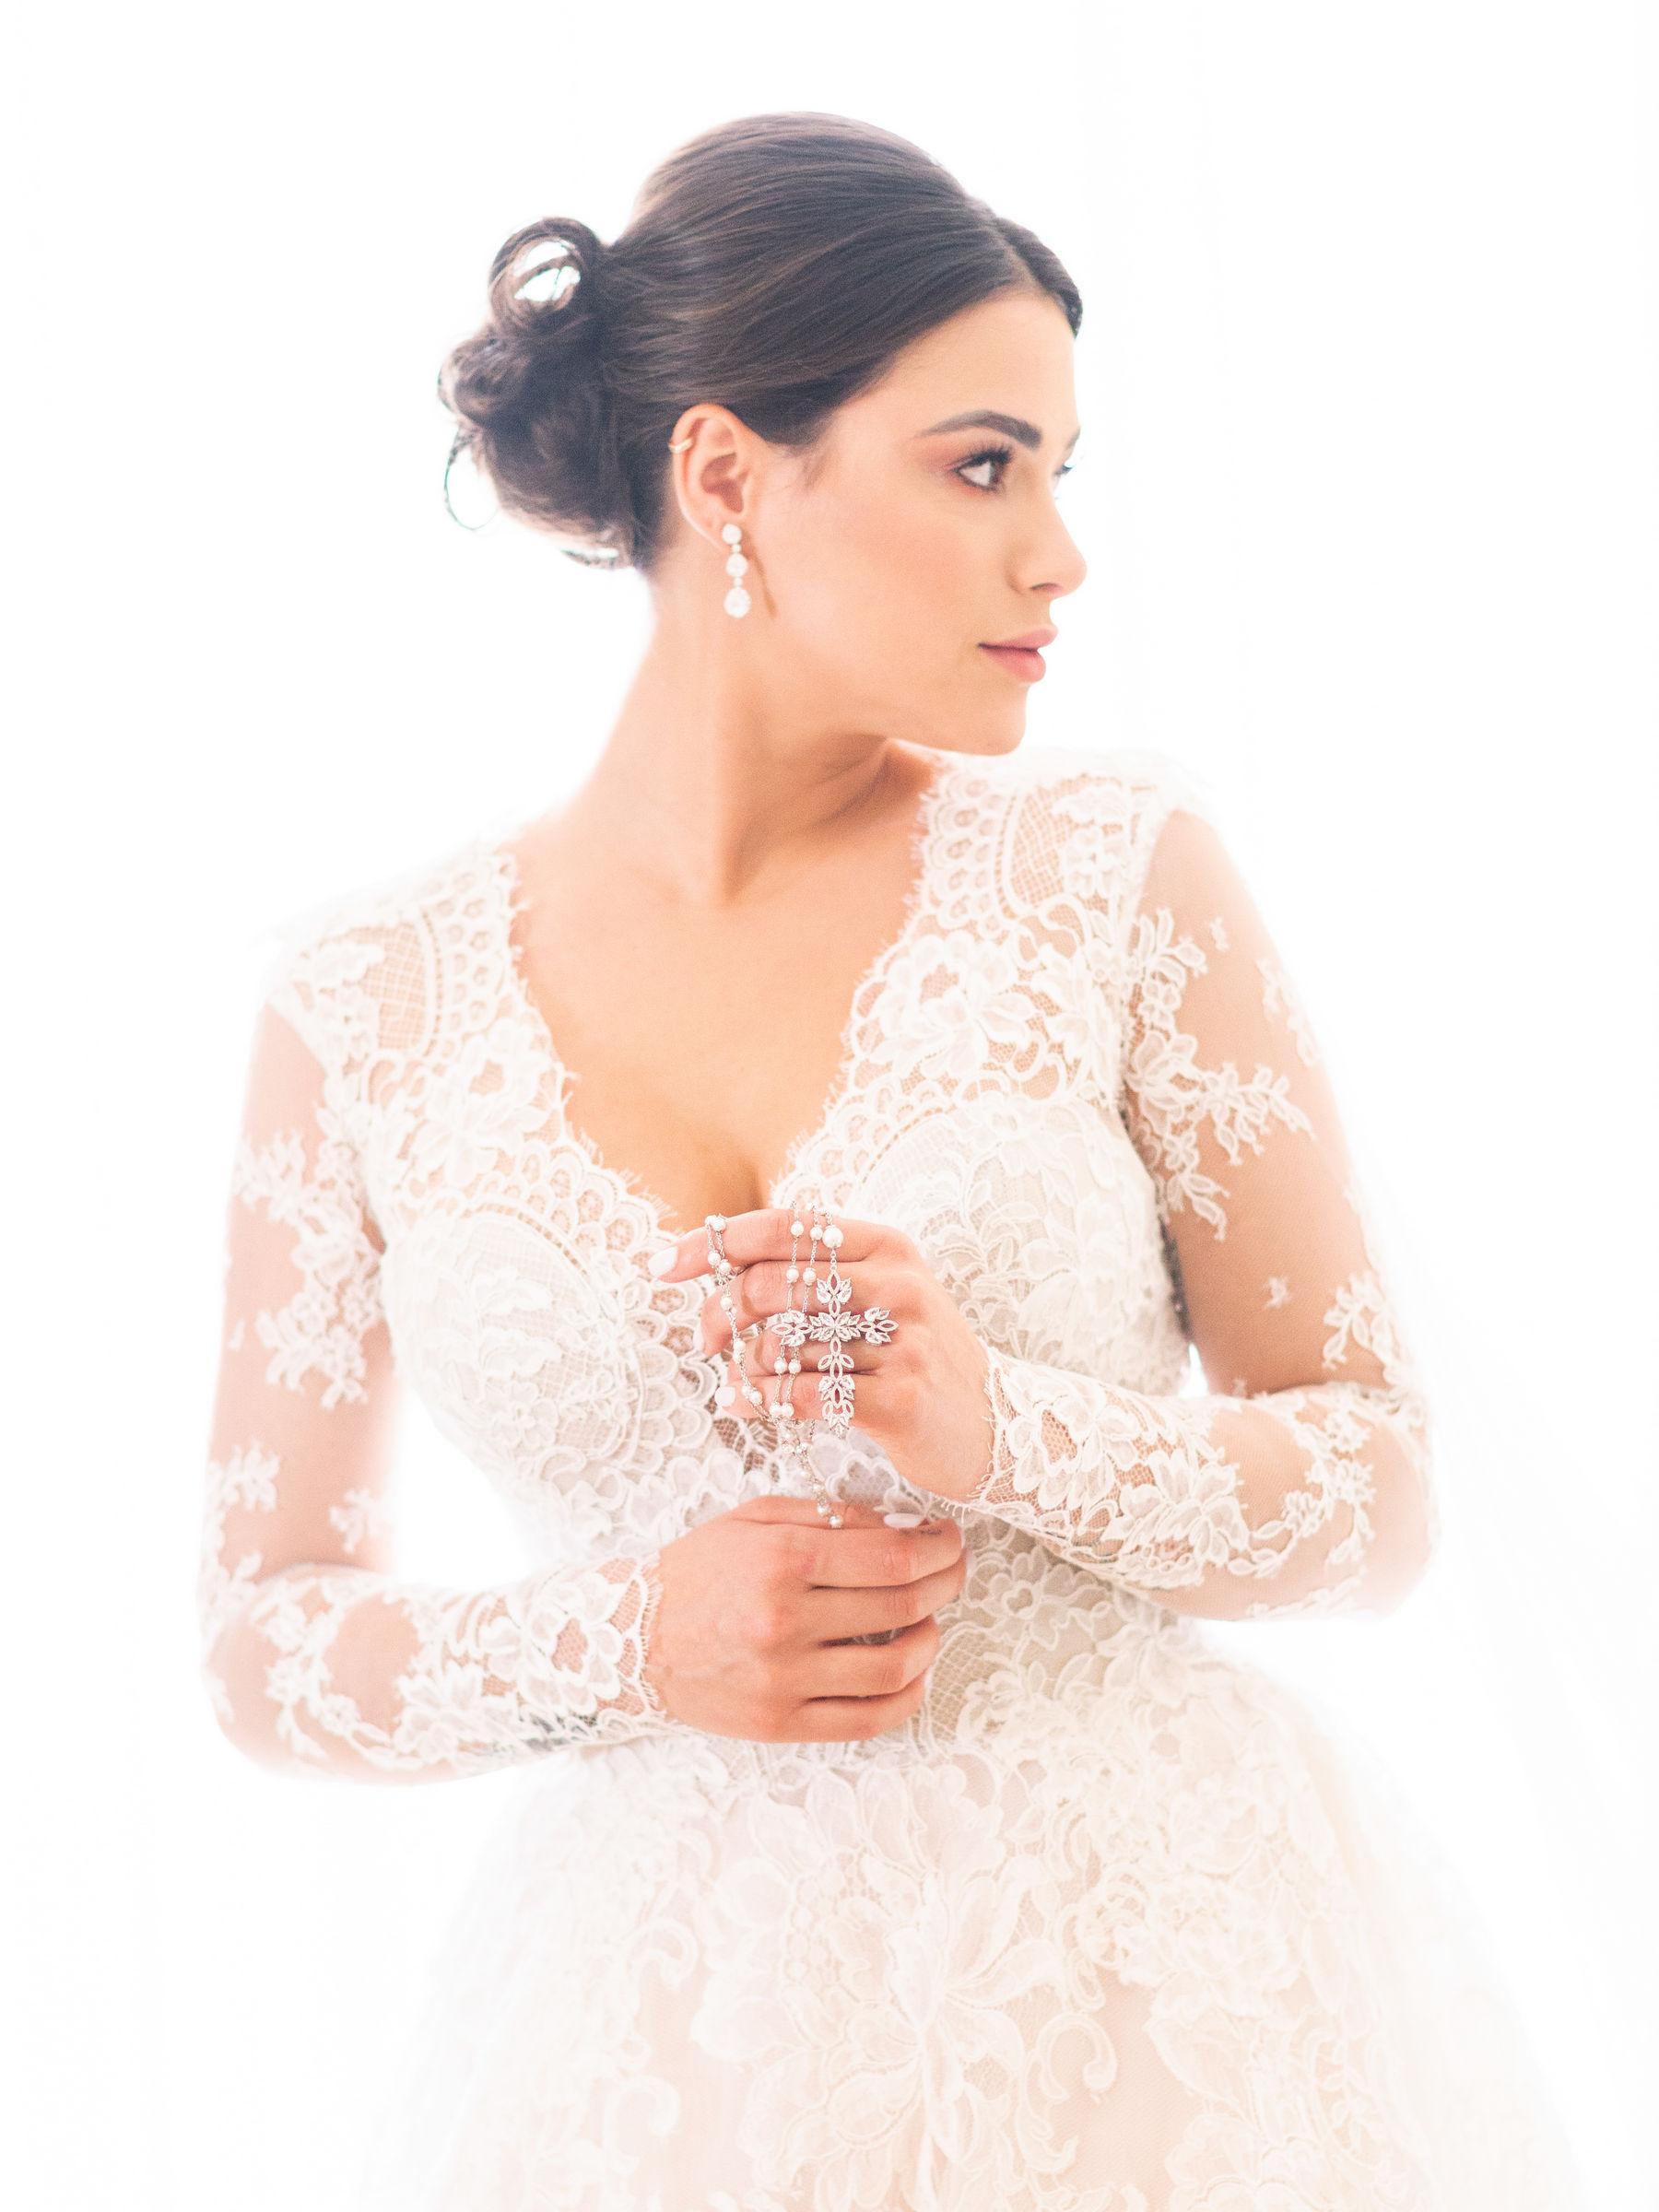 maria-eduardo-montage-beverly-hills-wedding-121.jpg